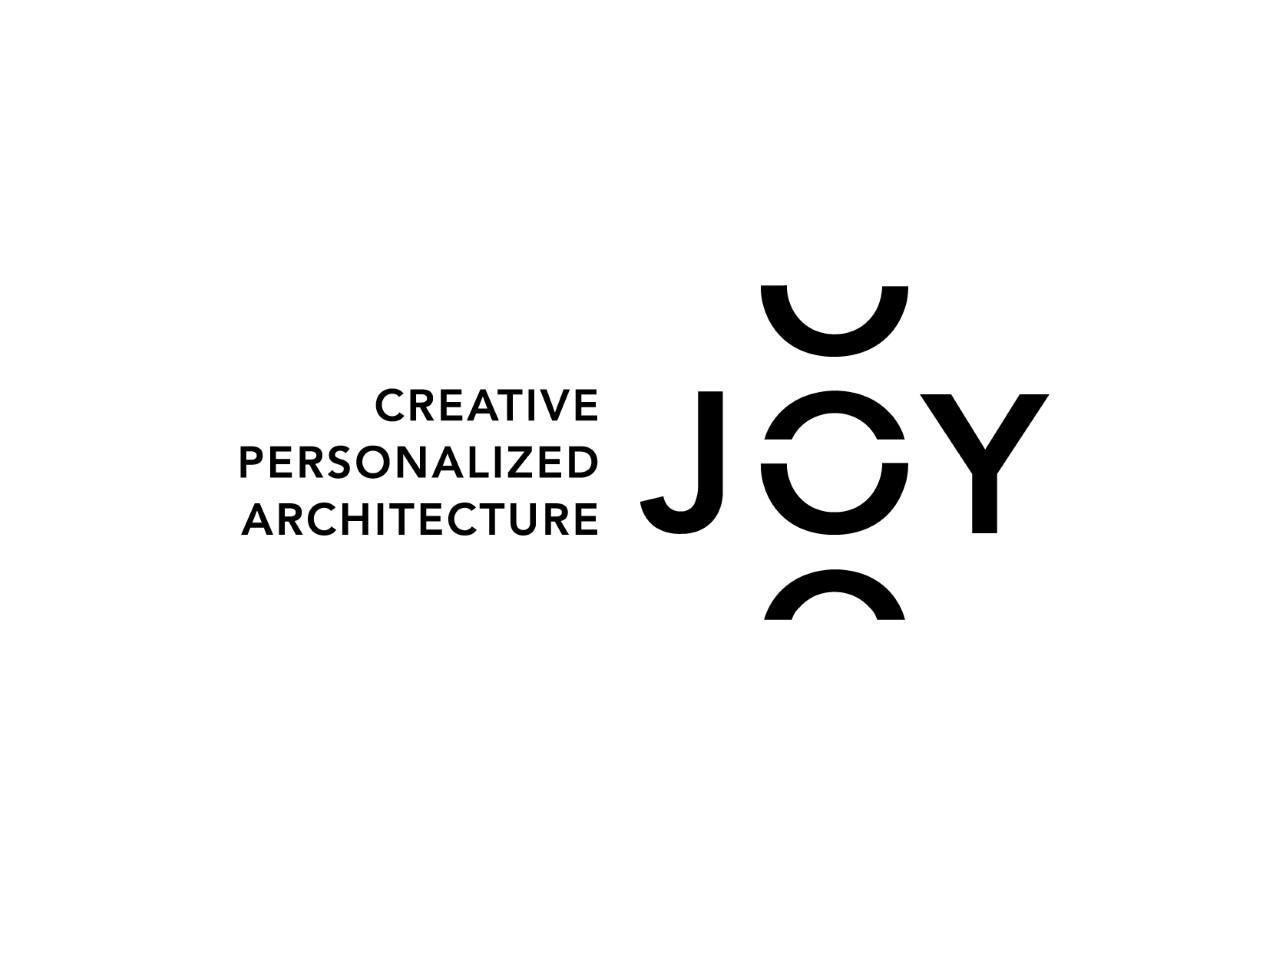 JOY architects